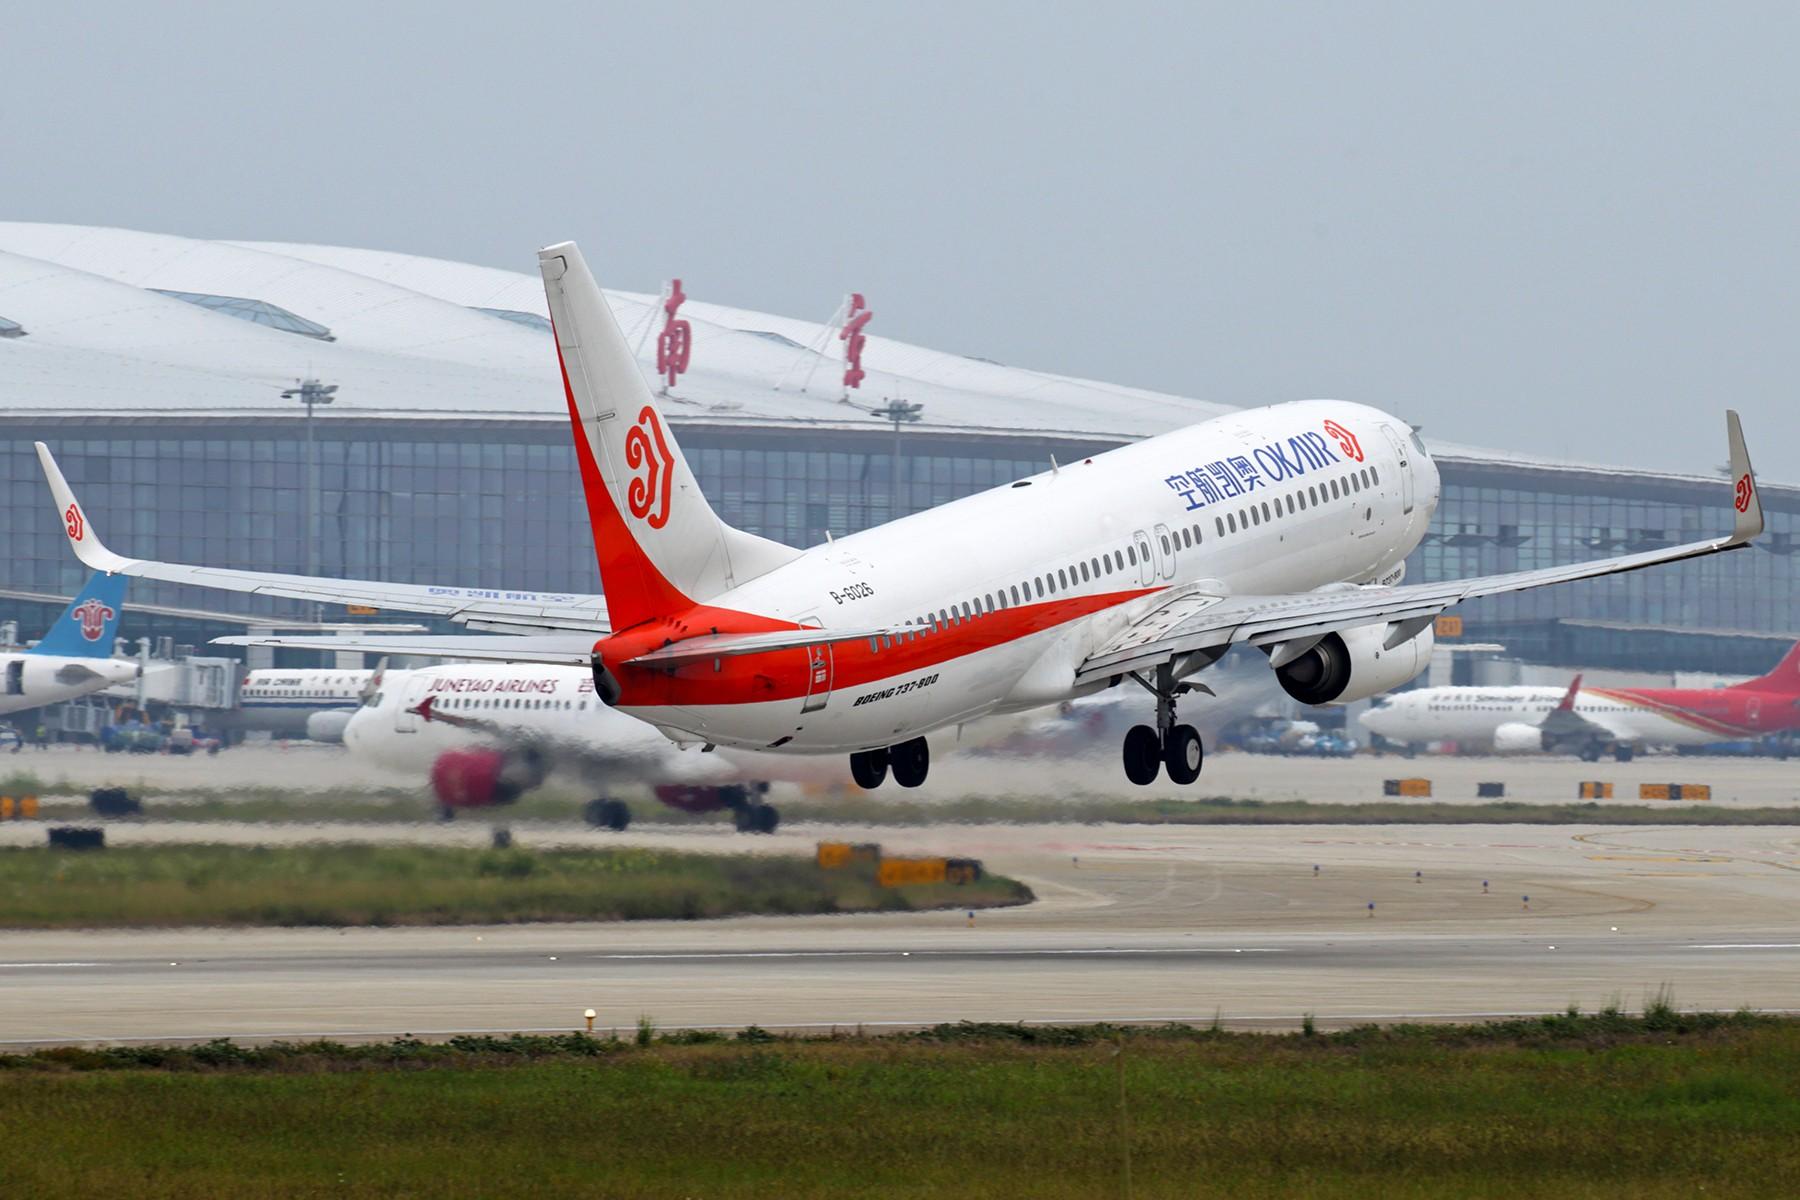 Re:[原创]【BLDDQ】******NKG07/25单跑道运行中****** BOEING 737-800 B-6026 中国南京禄口国际机场